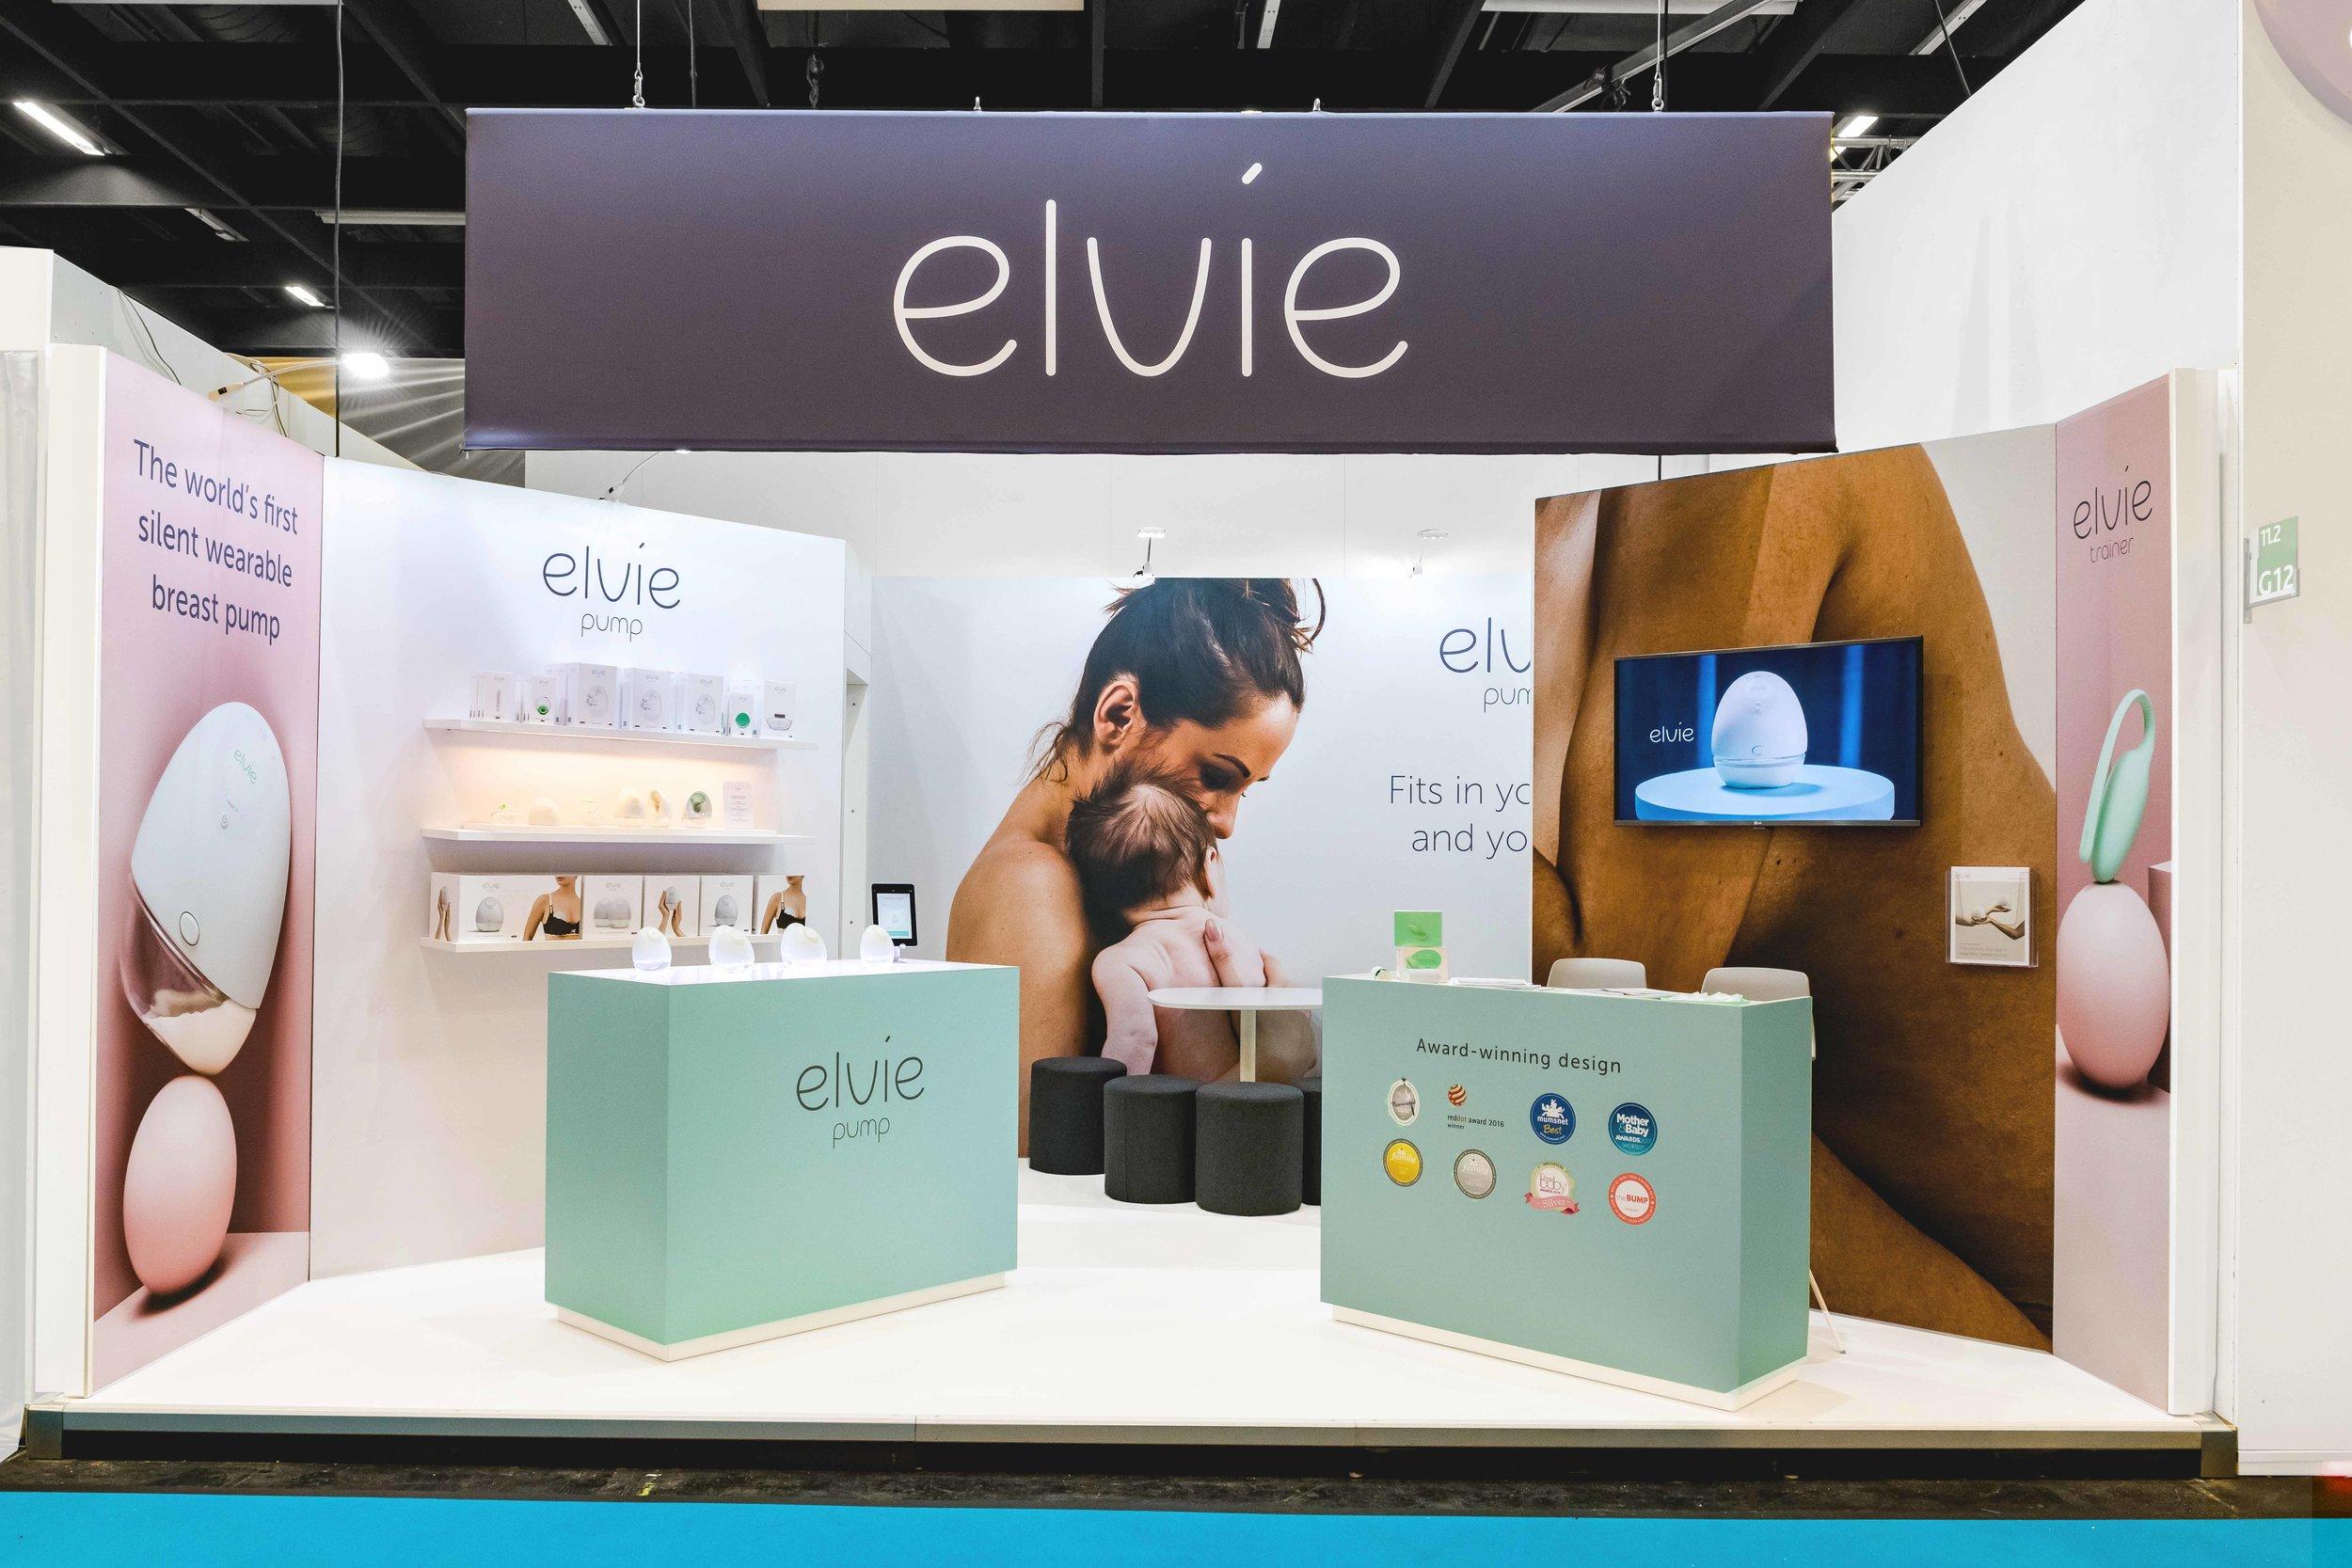 Elvie-1.jpg